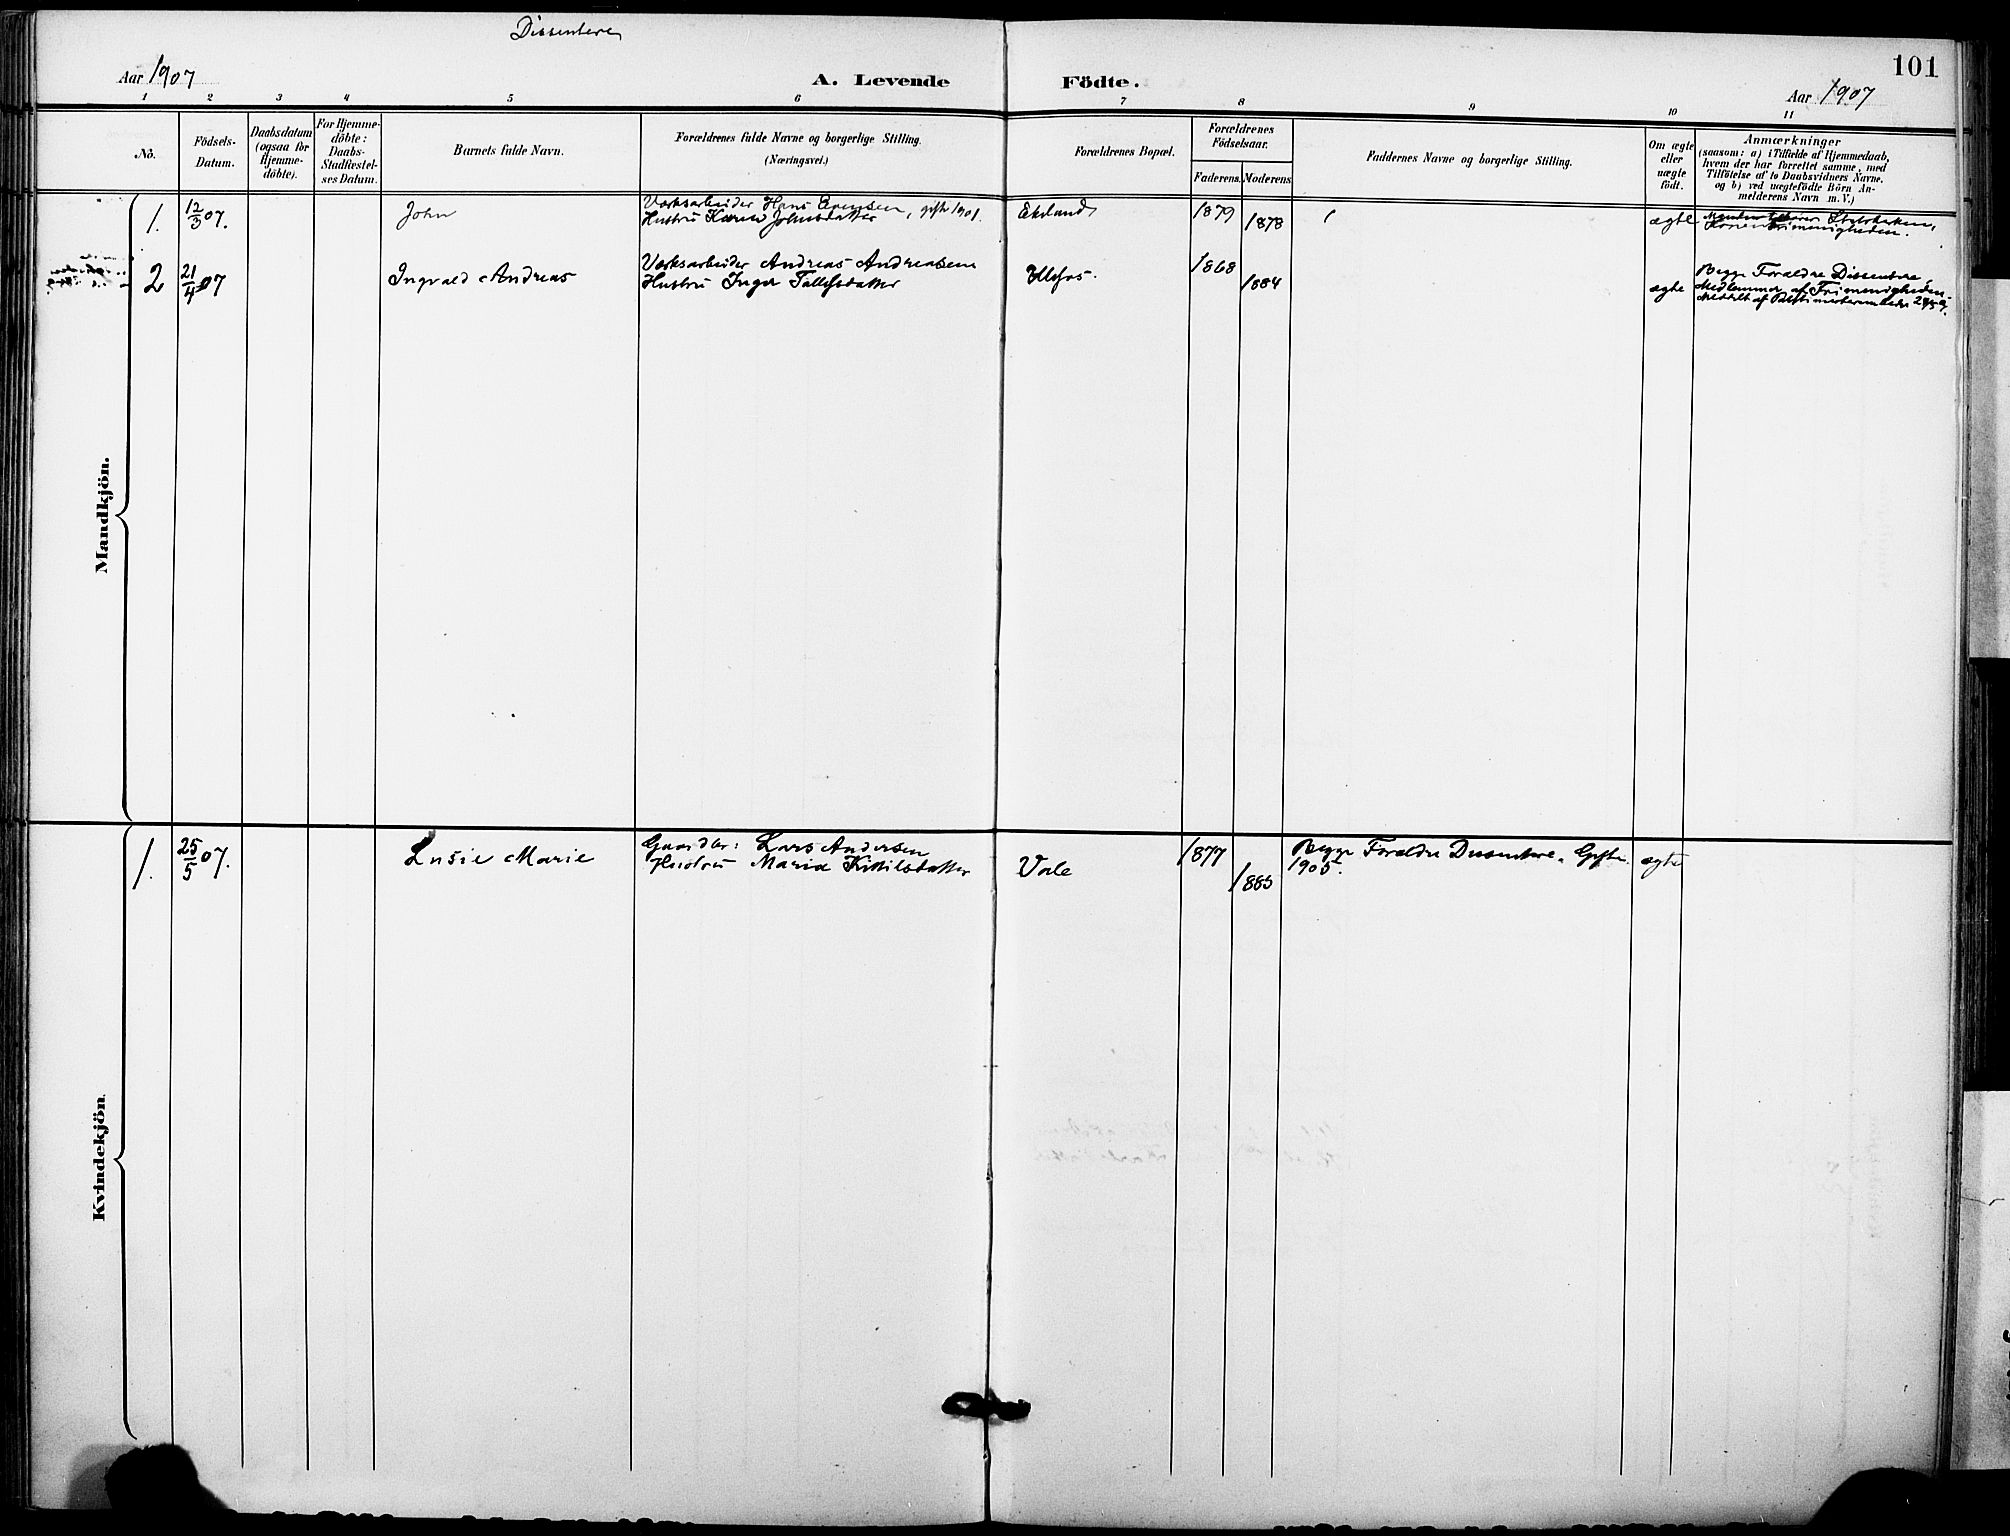 SAKO, Holla kirkebøker, F/Fa/L0010: Ministerialbok nr. 10, 1897-1907, s. 101